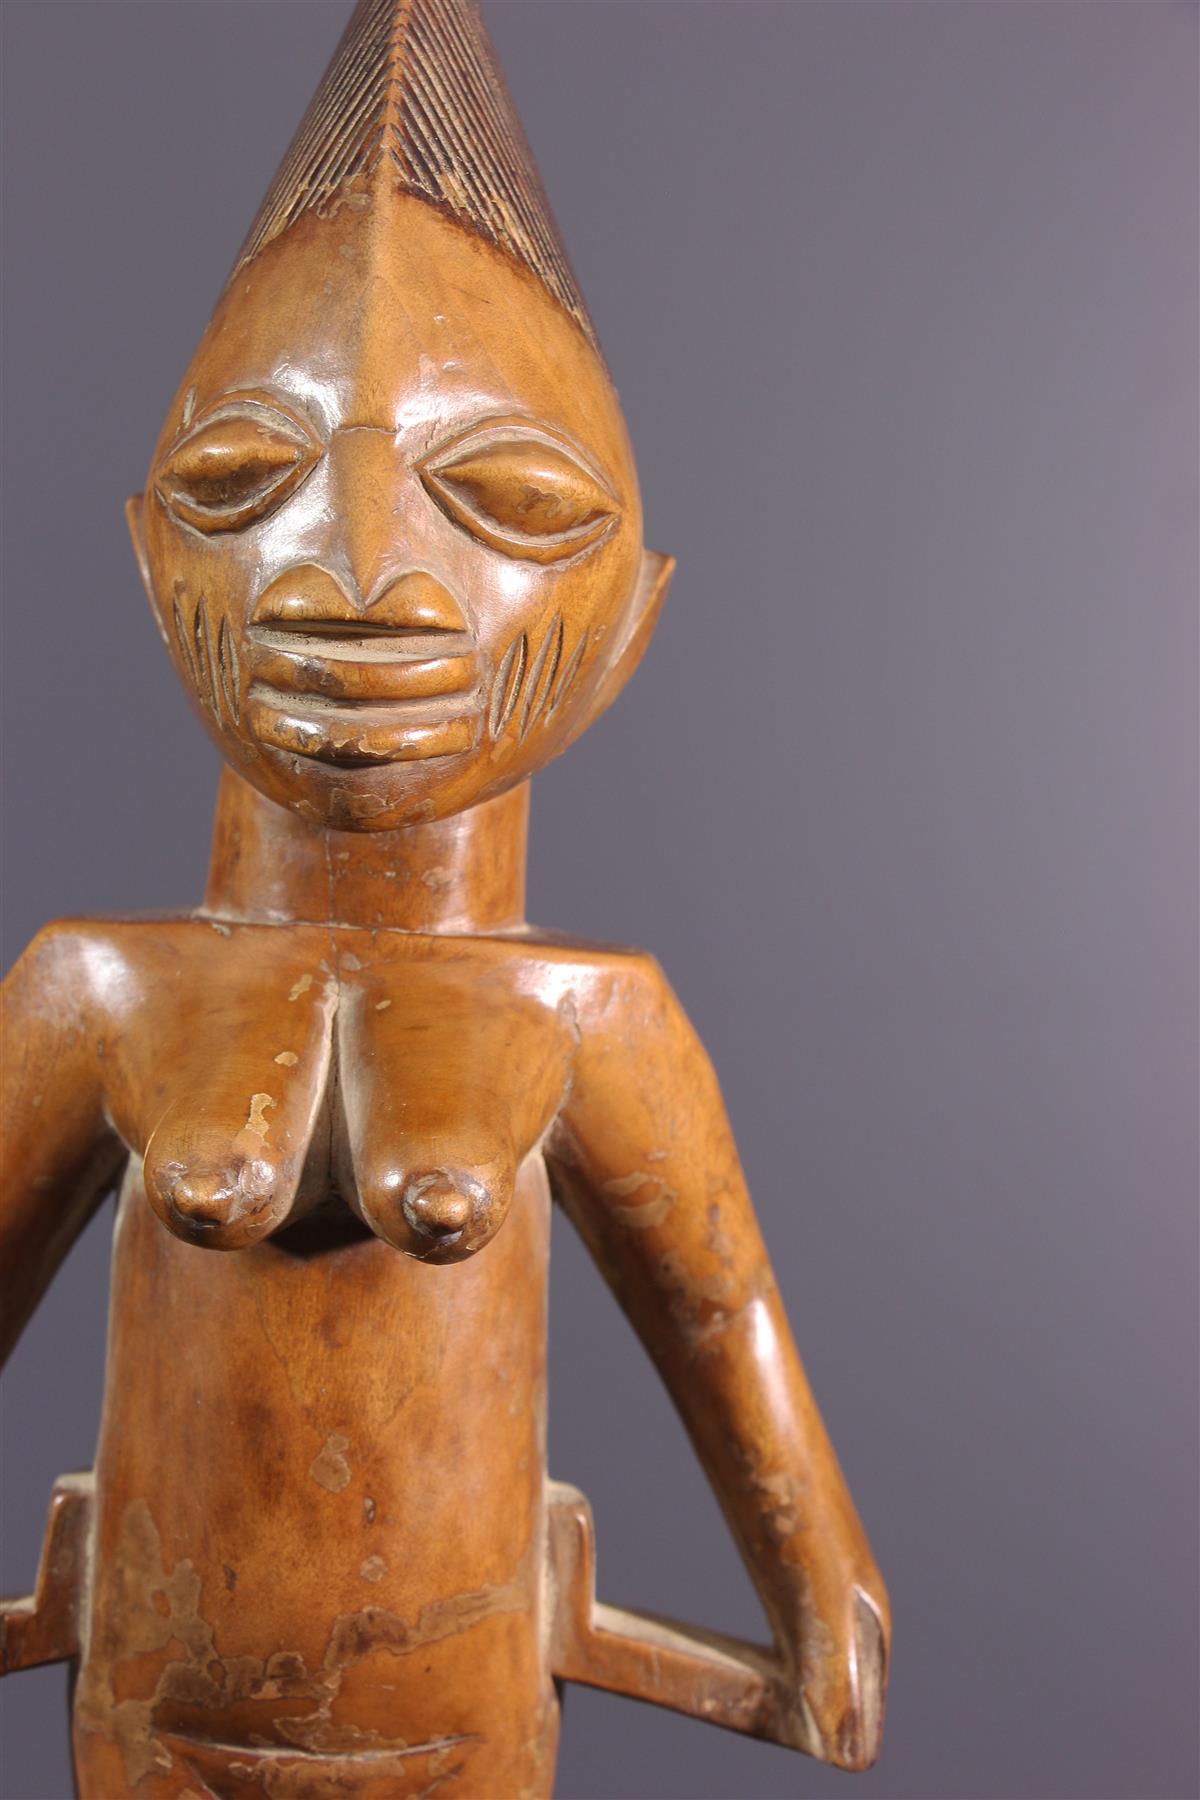 Statuette Ibeji - Art africain